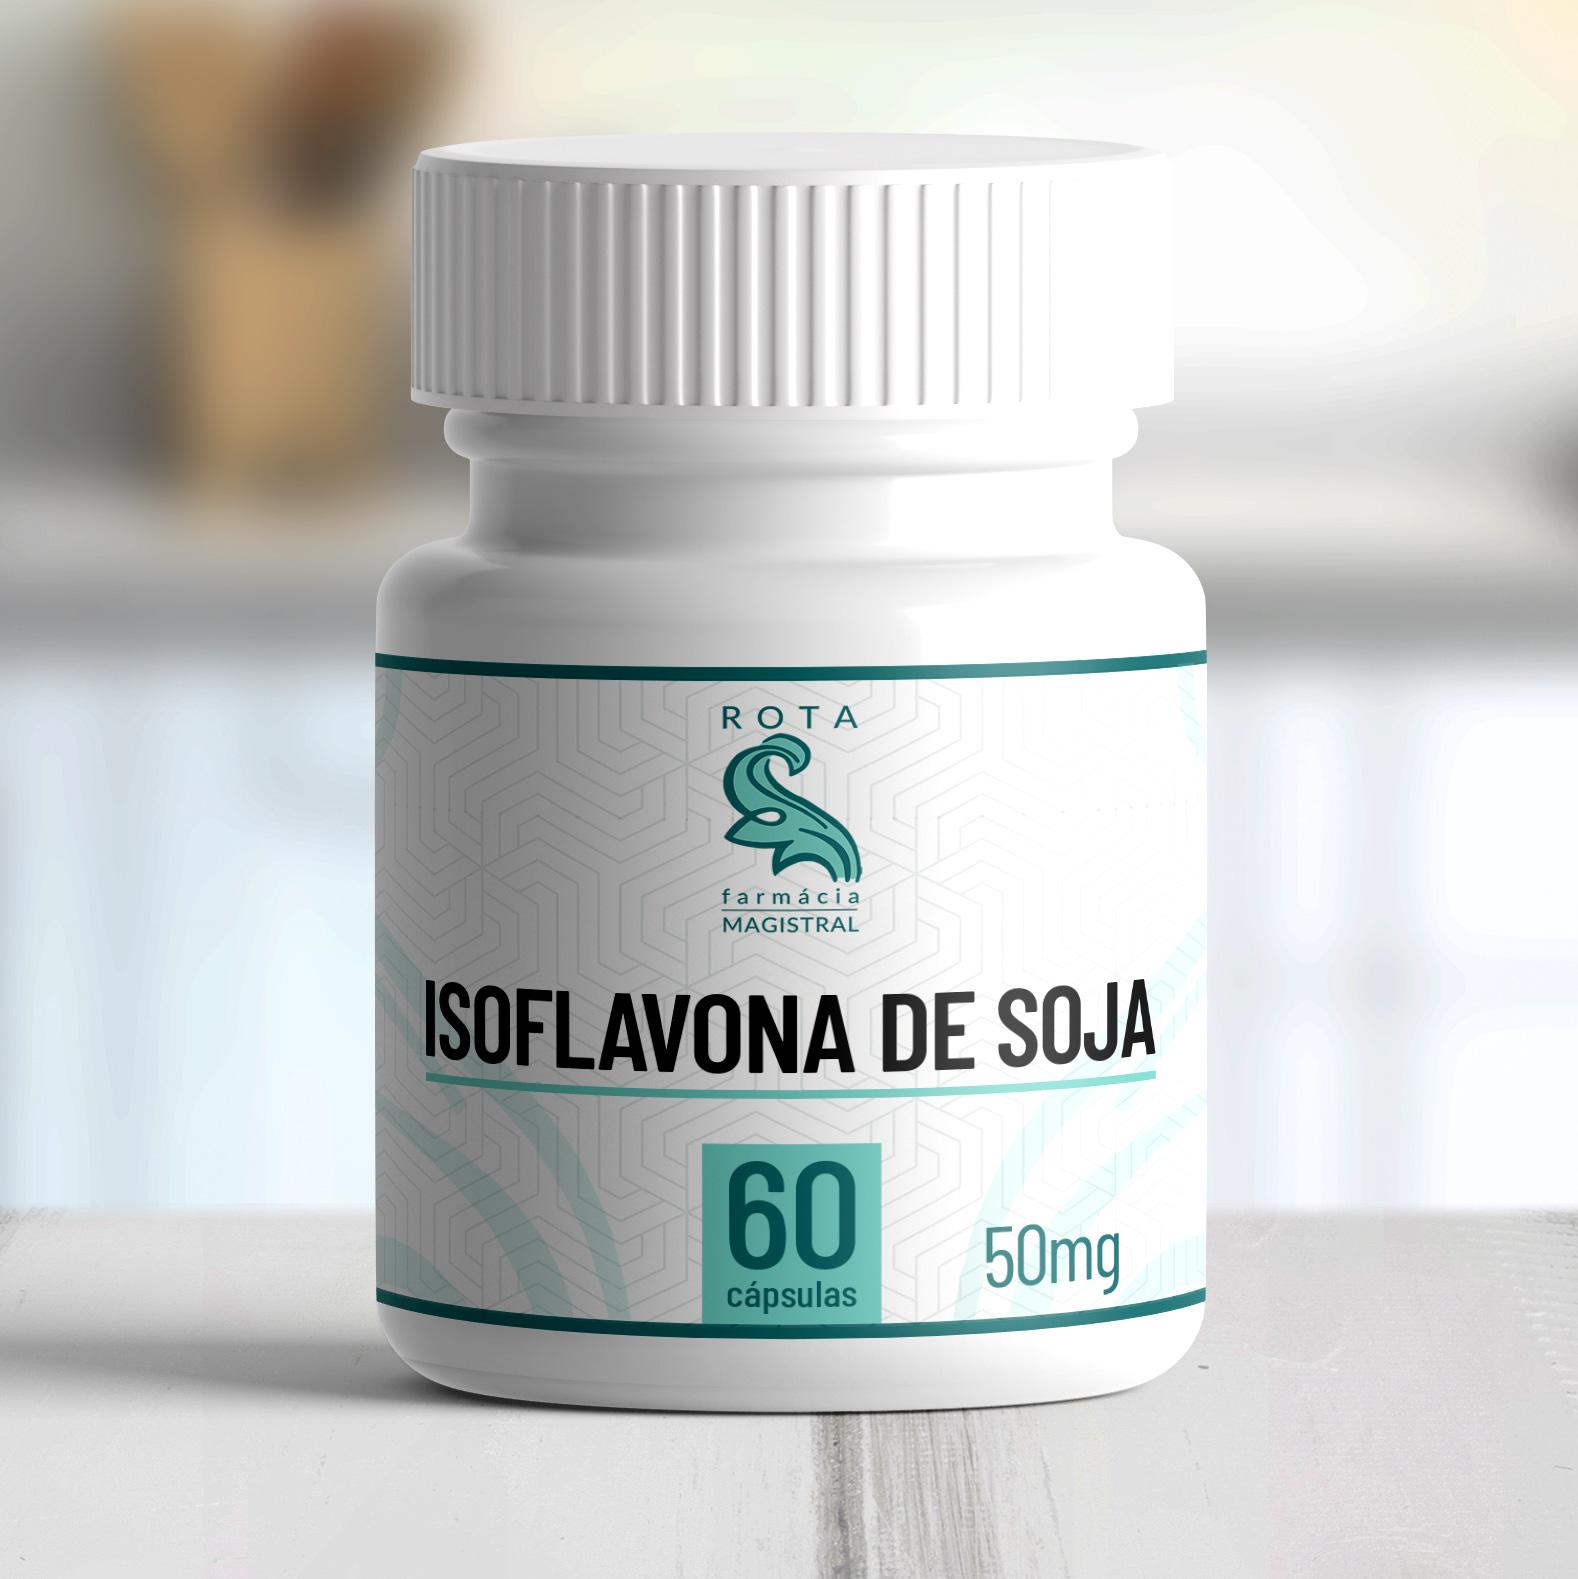 Isoflavona de Soja 50mg 60 cápsulas